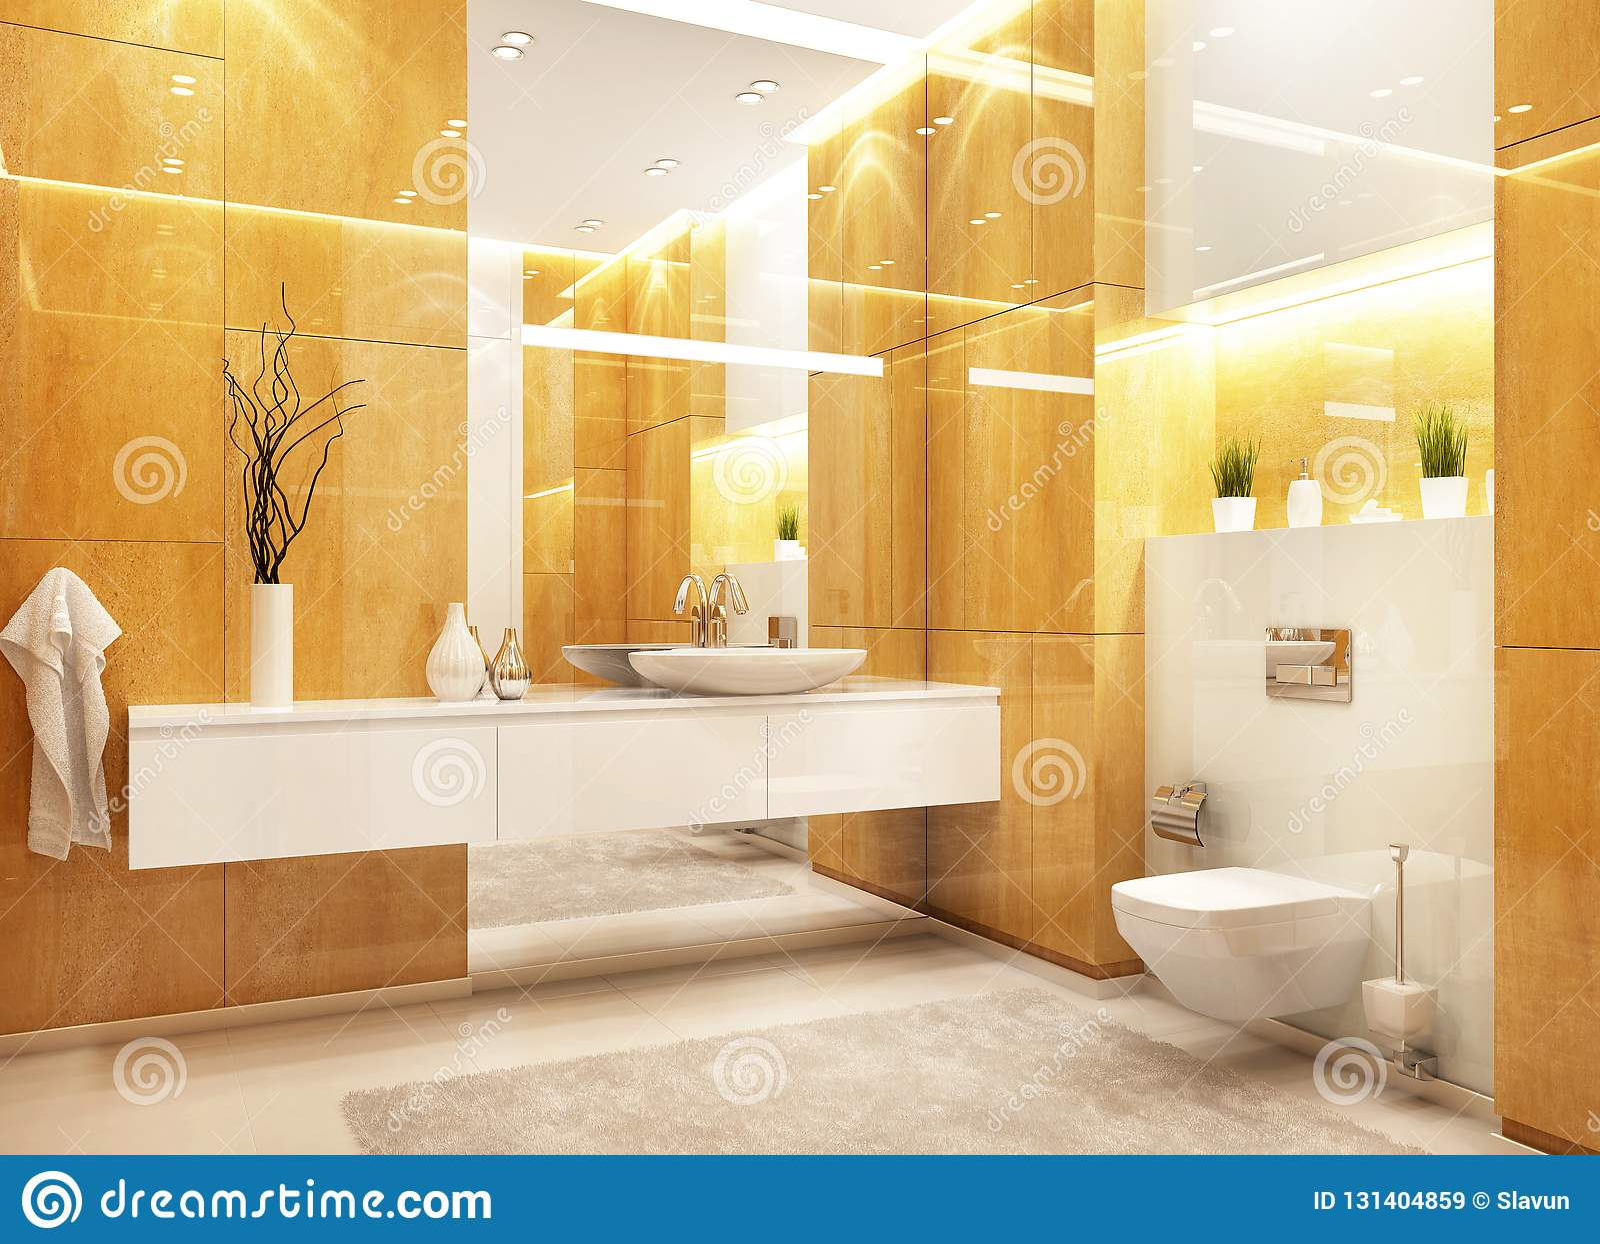 Cuartos De Baño Diseños Modernos | Cuartos De Baño De Diseño